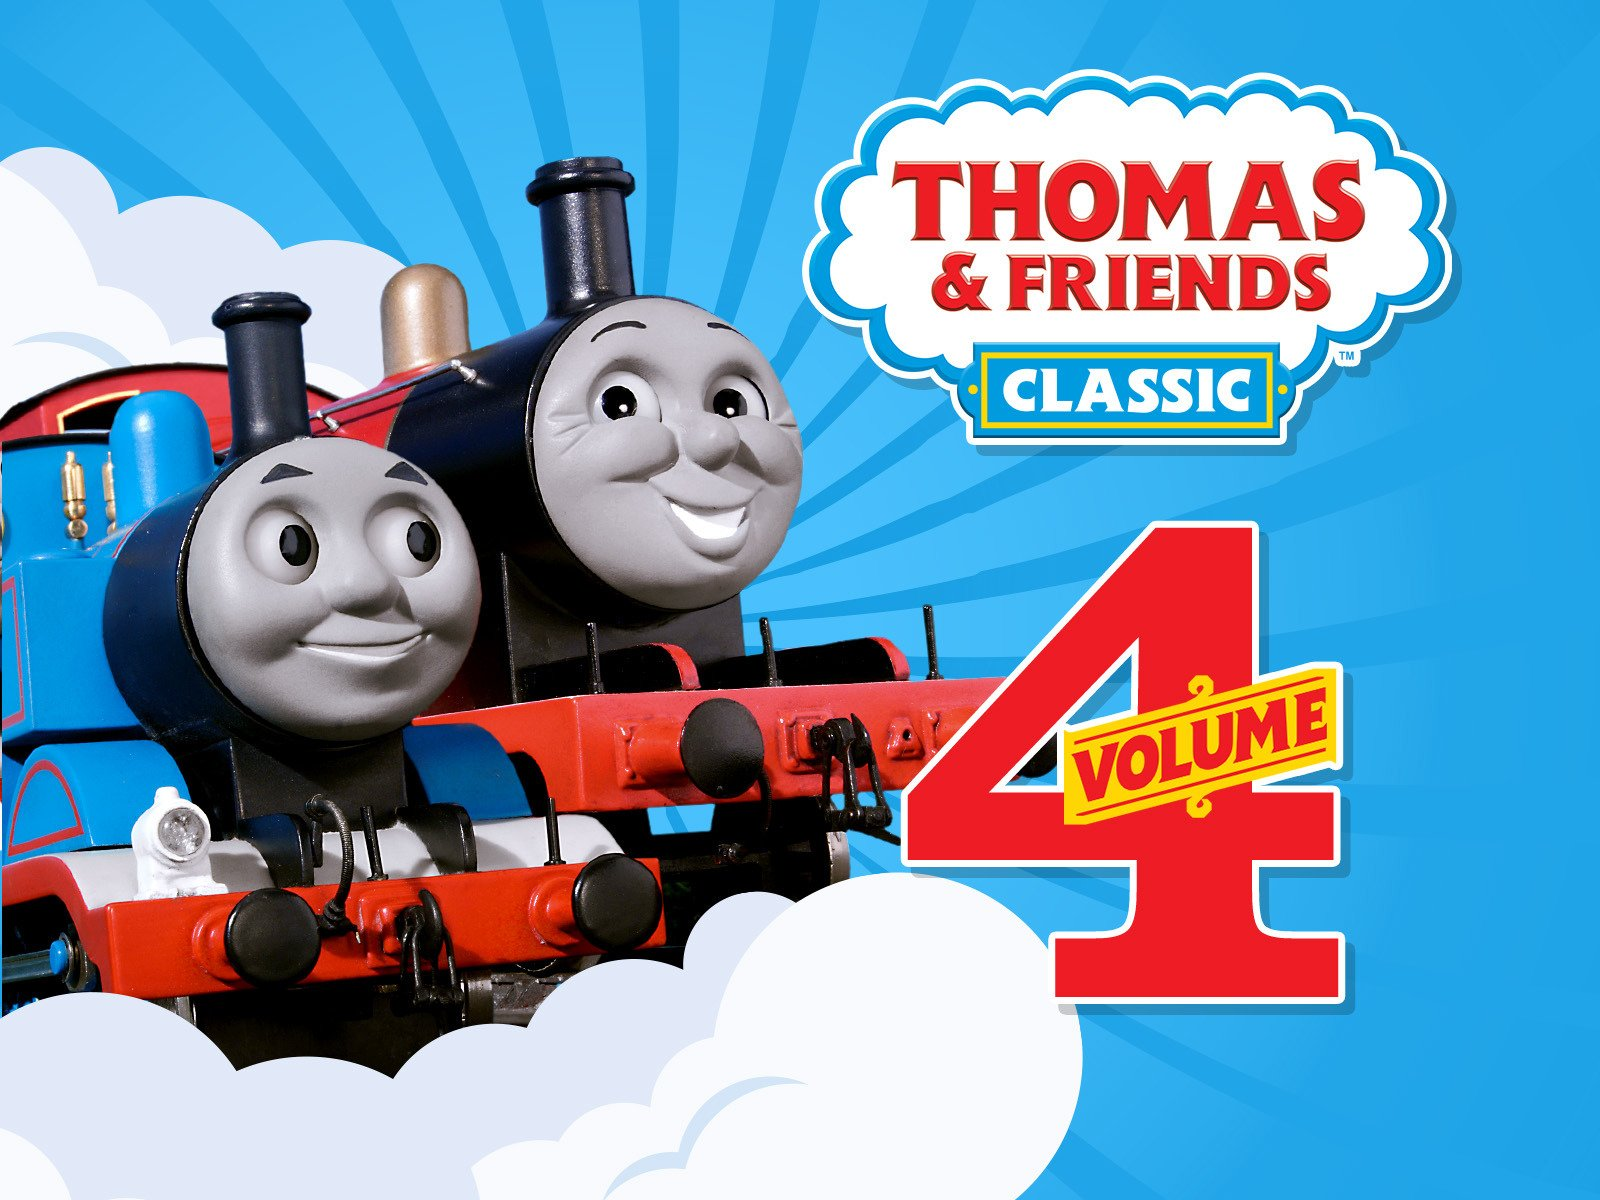 Thomas & Friends Classic Volume 4